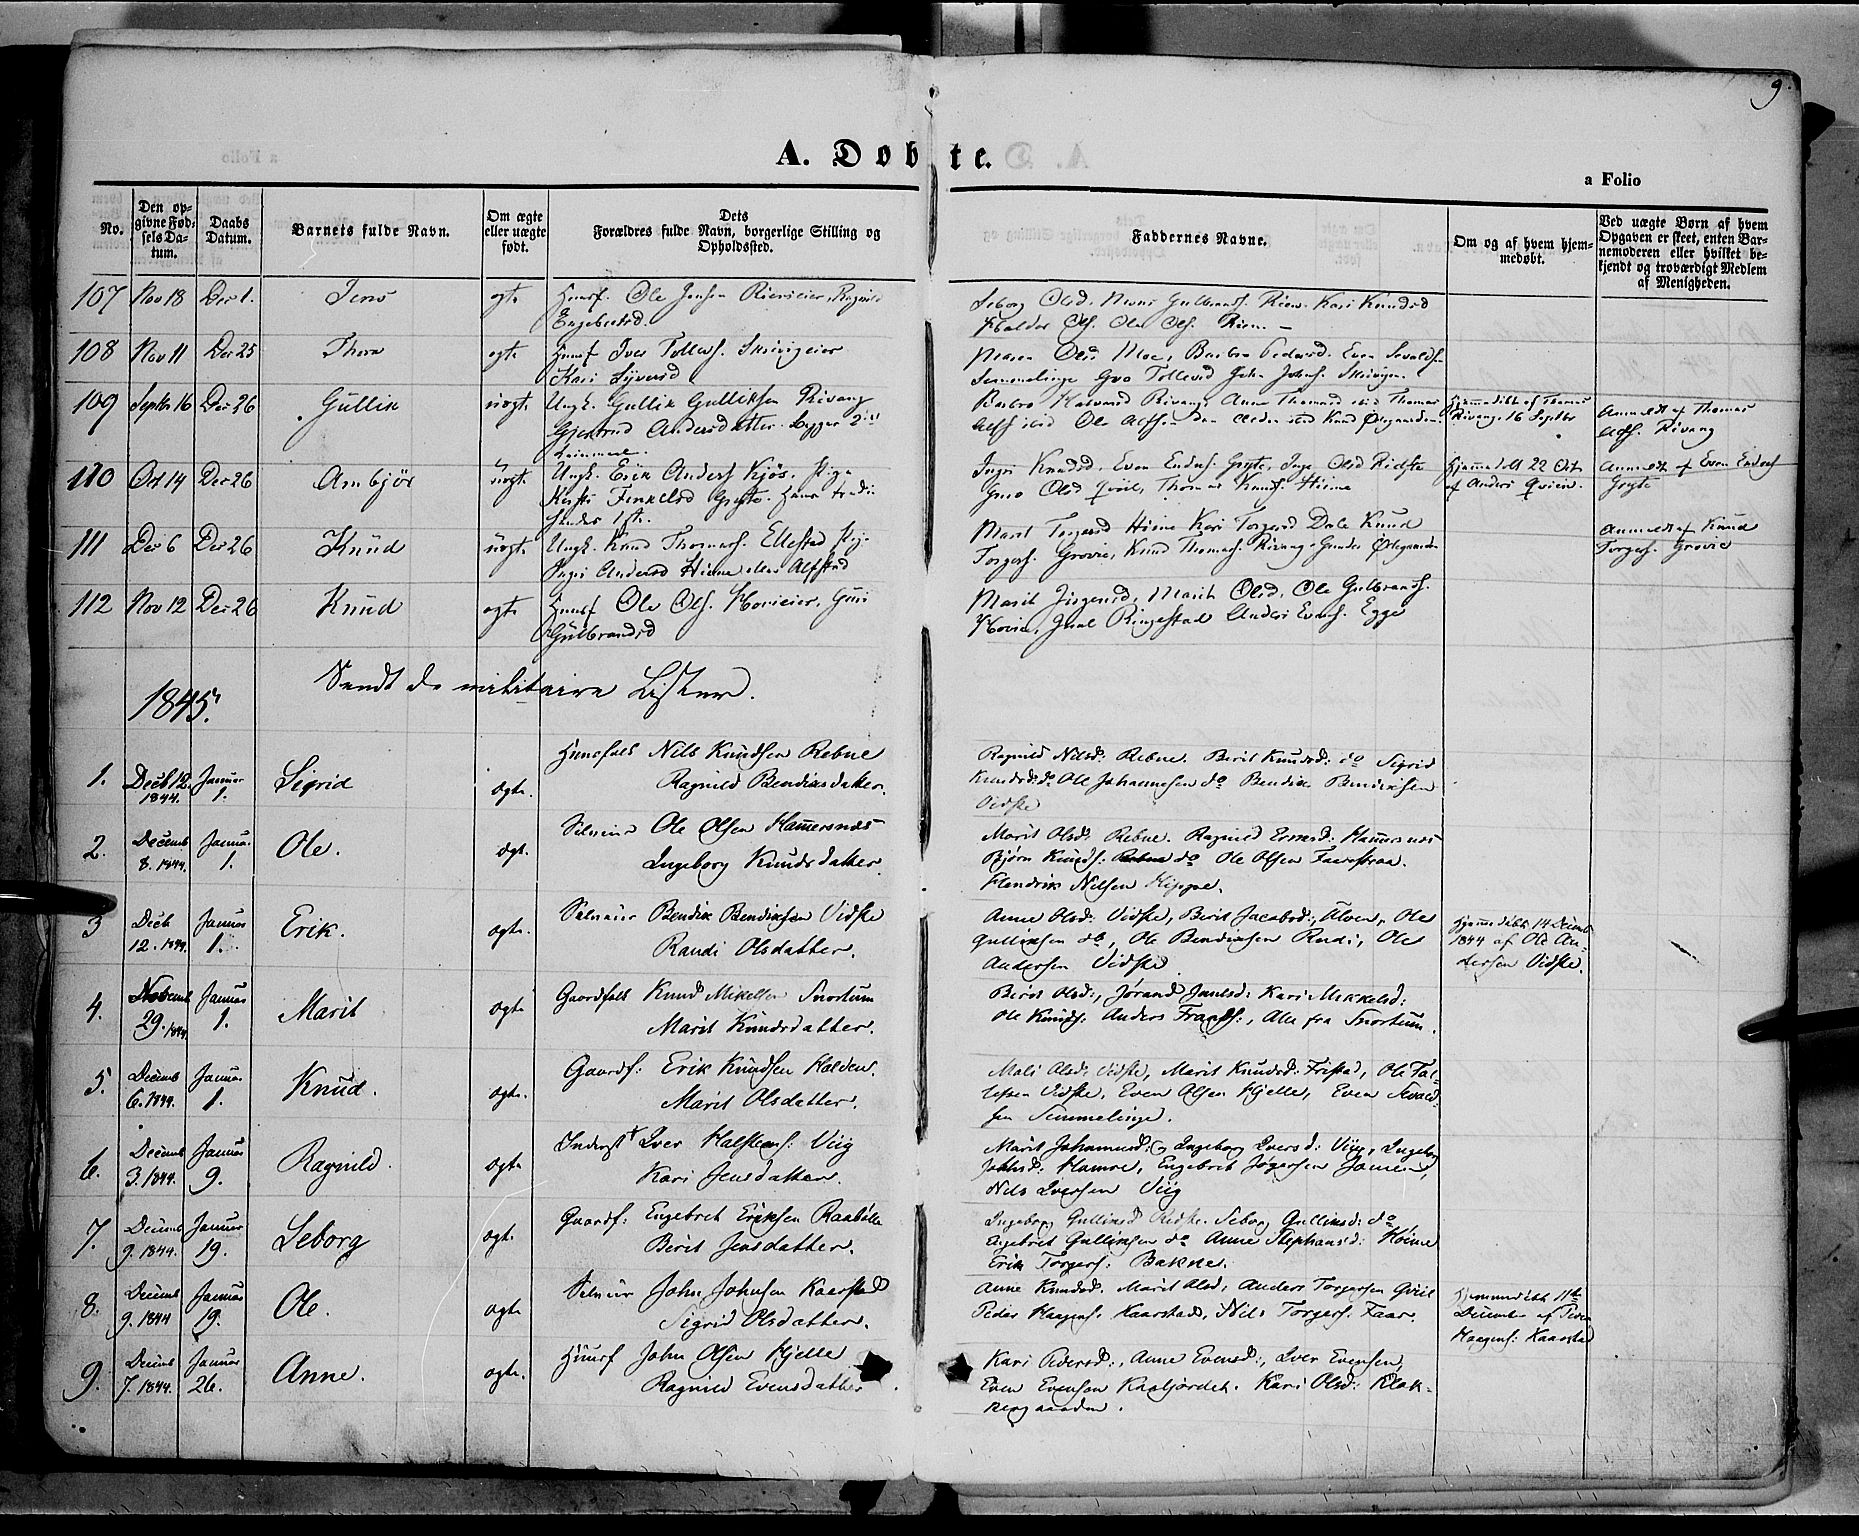 SAH, Vestre Slidre prestekontor, Ministerialbok nr. 1, 1844-1855, s. 9